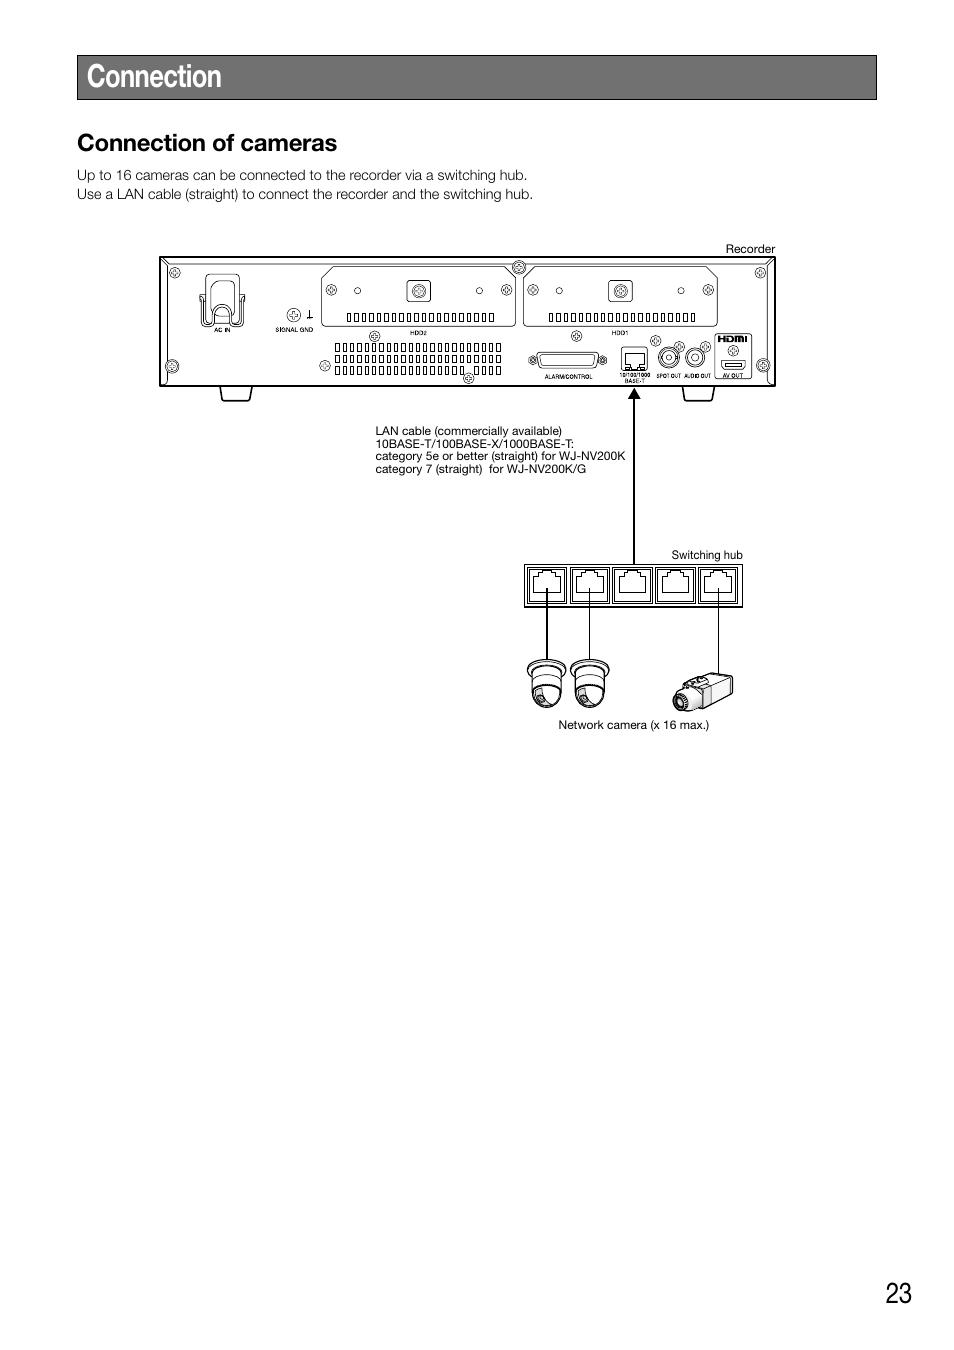 connection connection of cameras panasonic wj nv200 user manual rh manualsdir com Panasonic Viera Manual Panasonic TV Manual